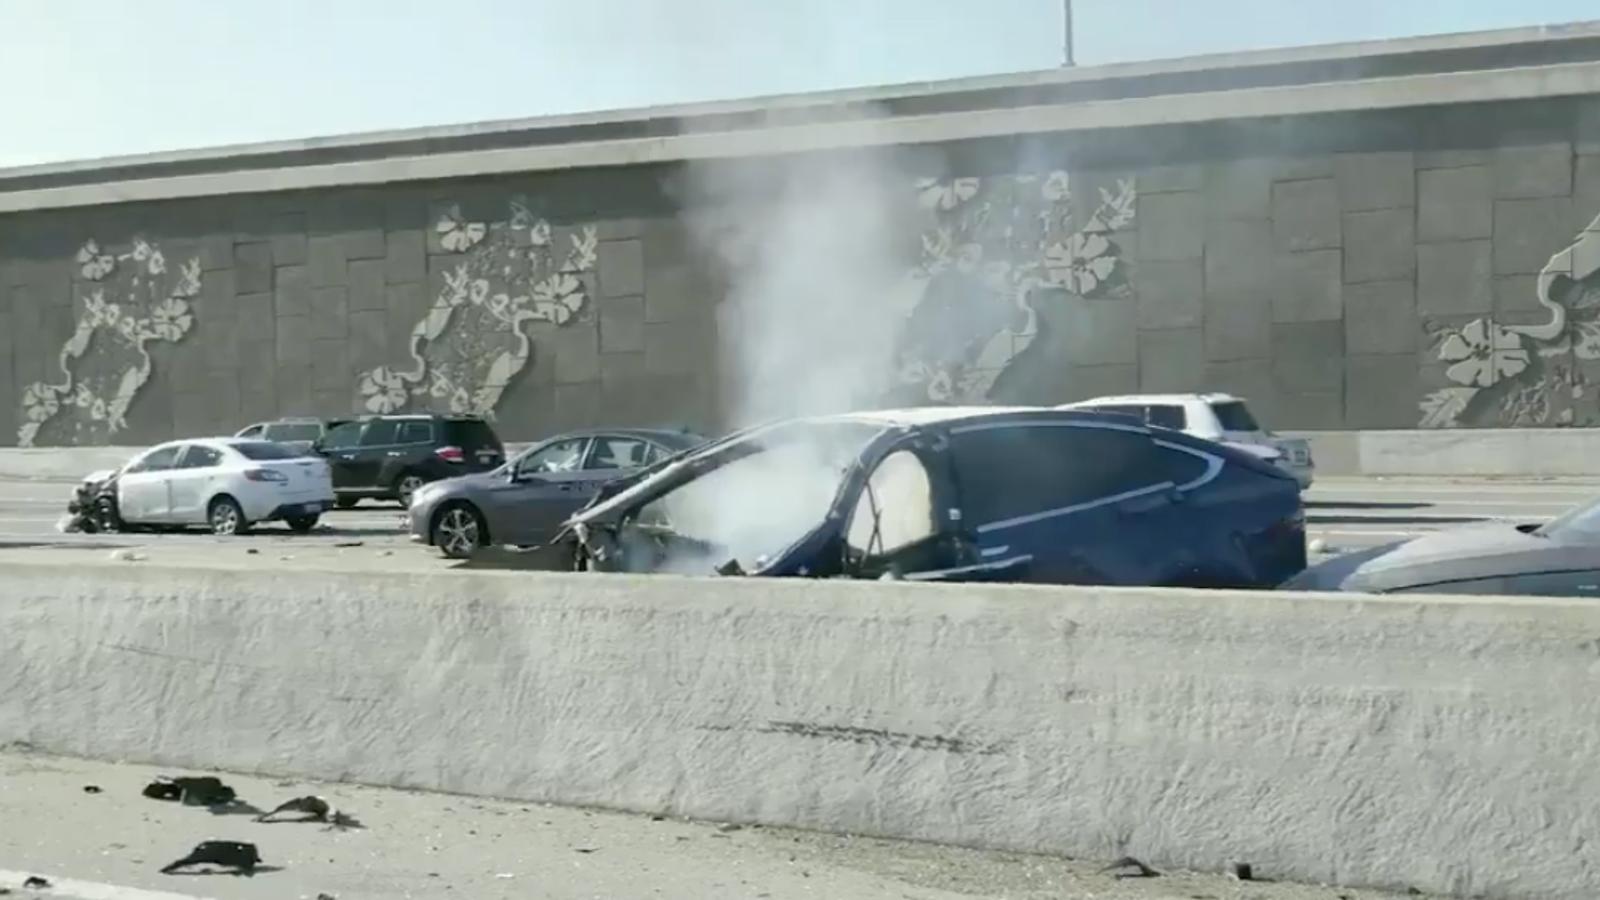 NTSB Opens Investigation Into Deadly Tesla Model X Crash